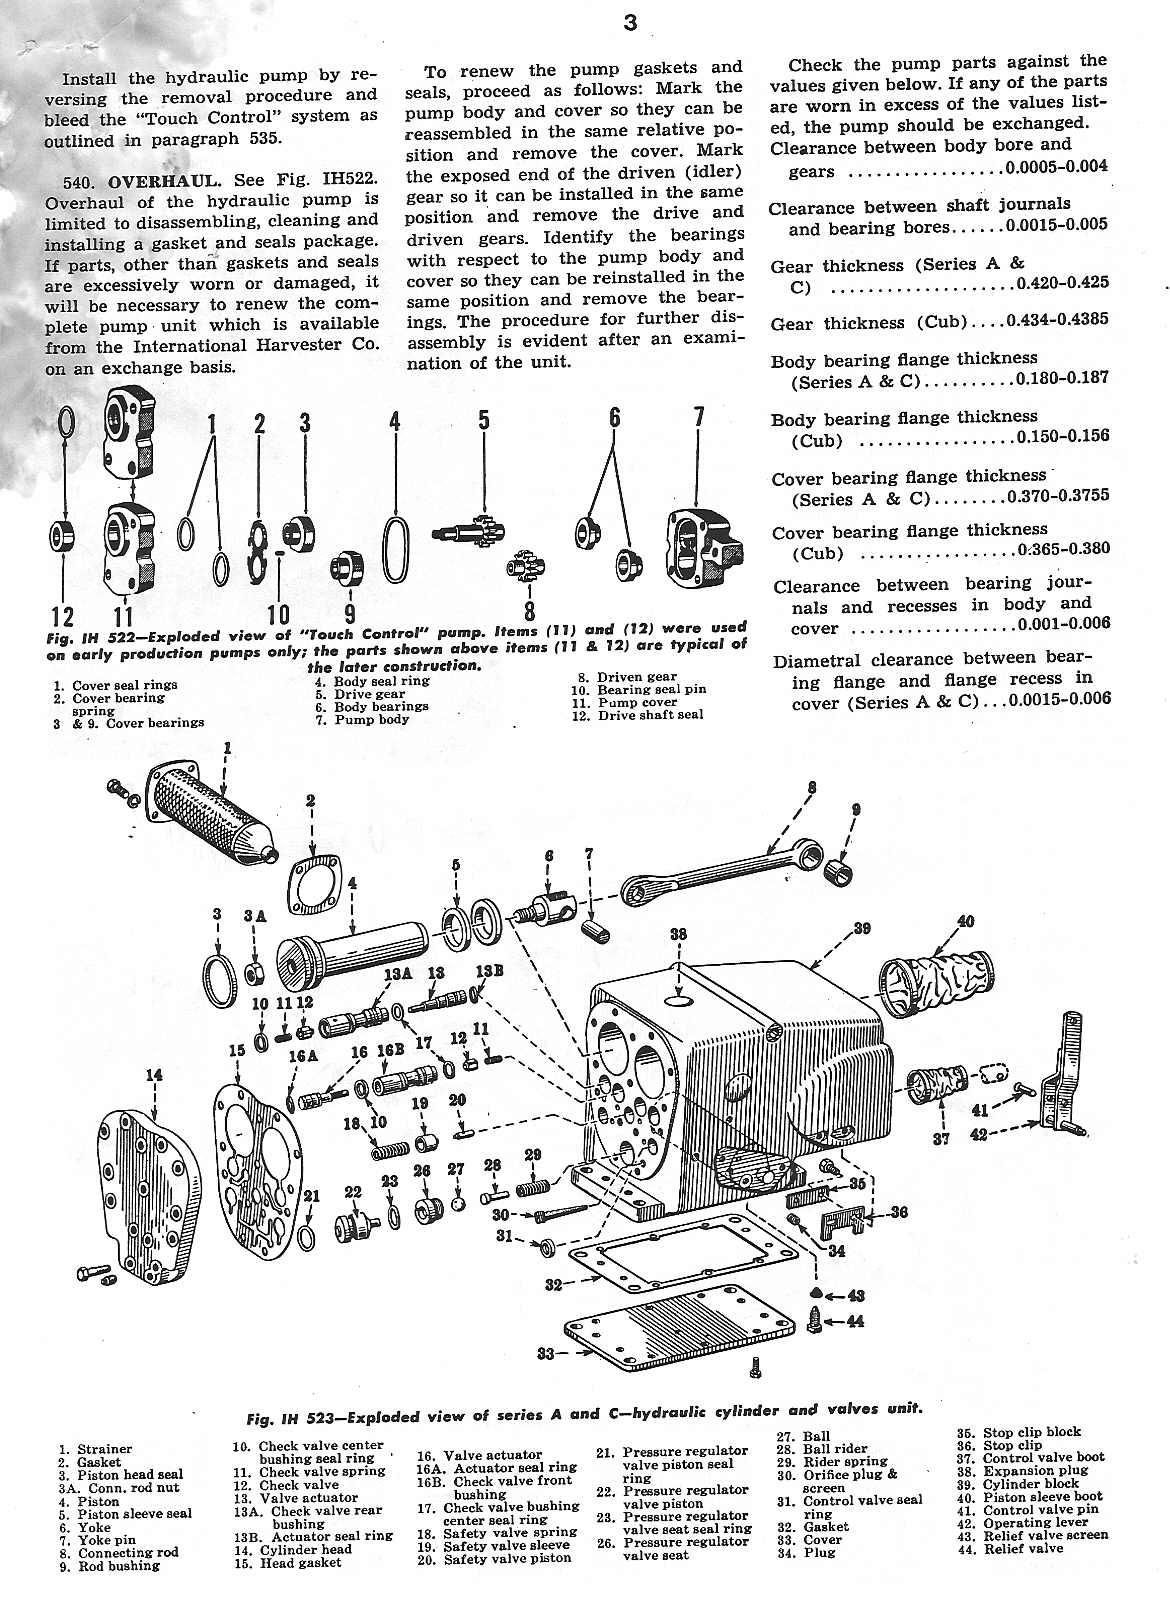 1951 farmall m wiring diagram 12v switch hydraulics quit working page 3 cub